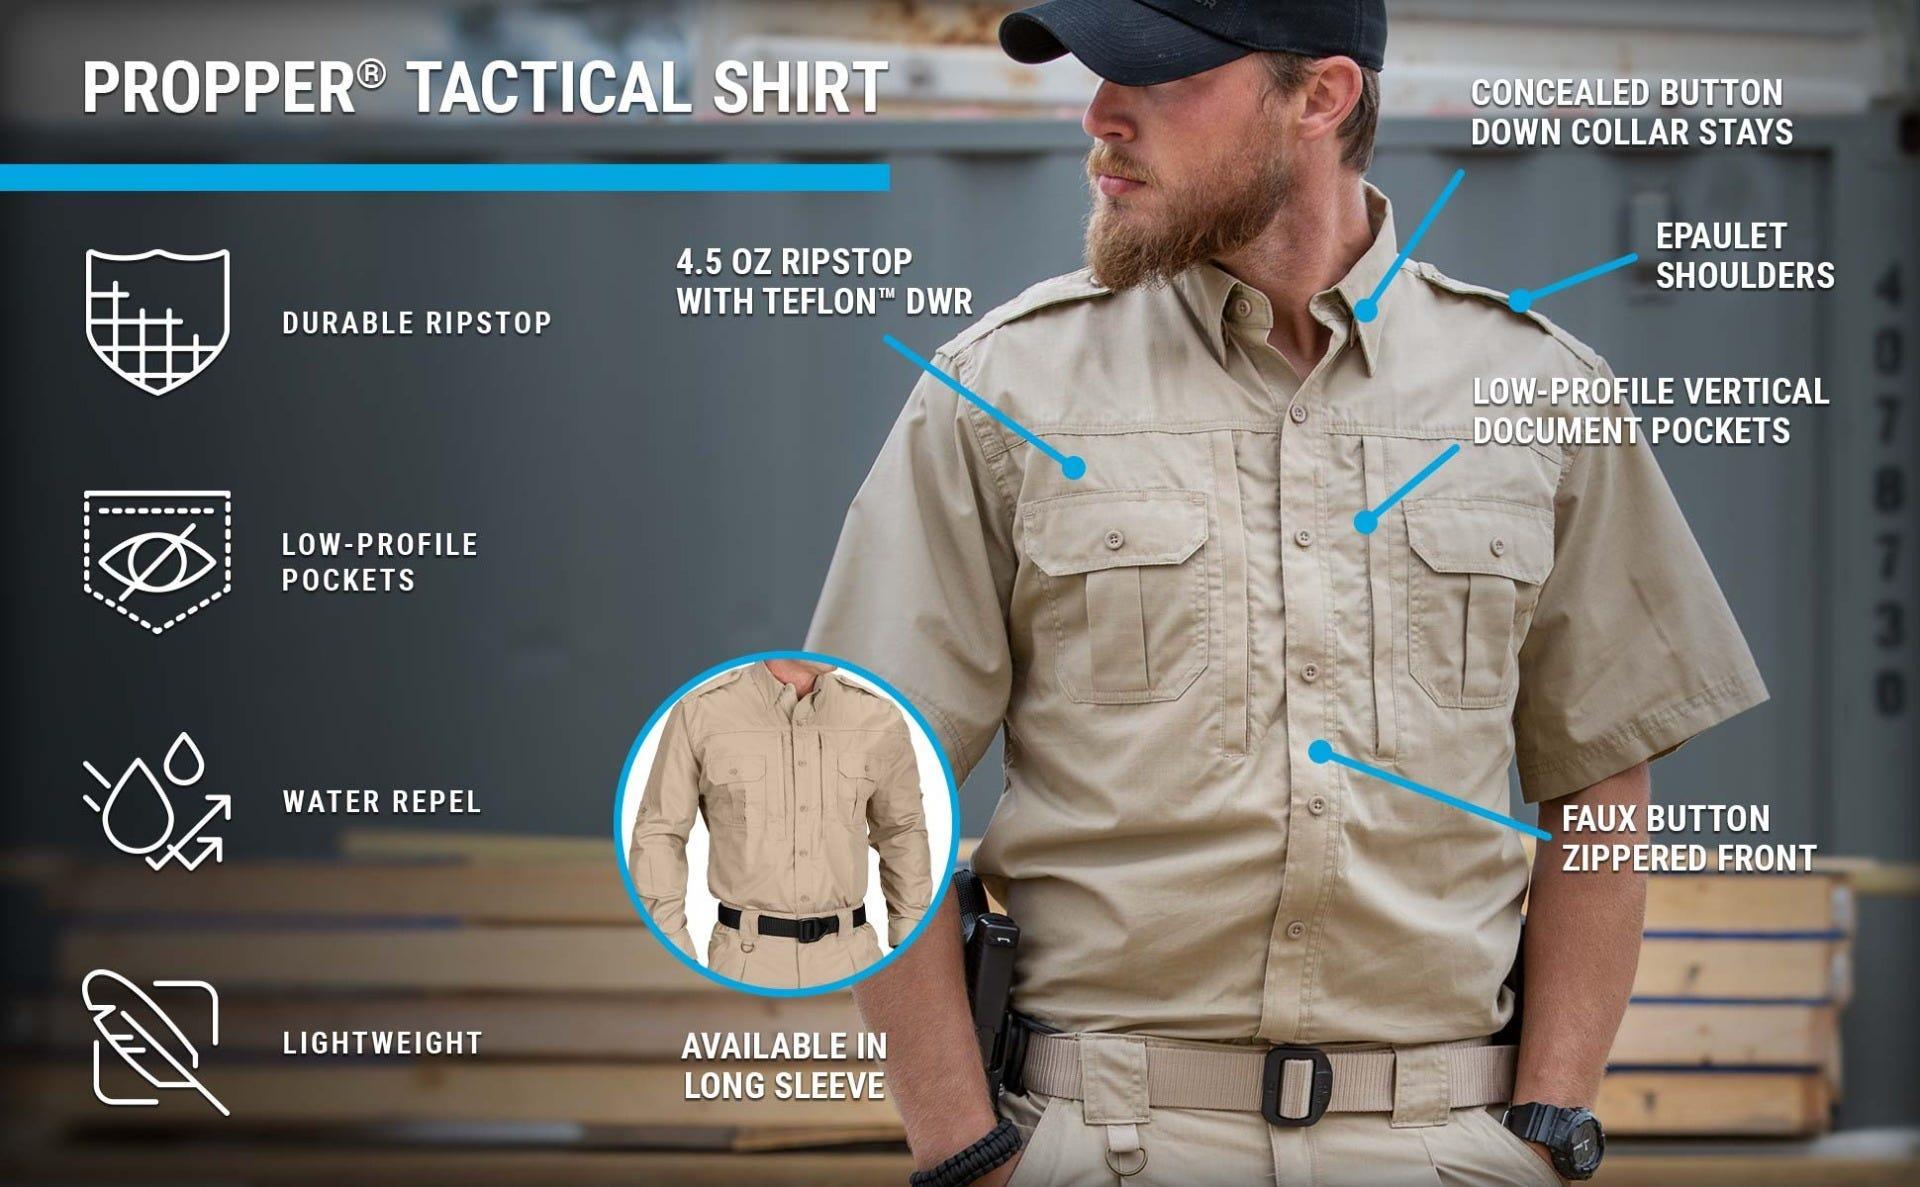 Guy on range in khaki ripstop tactical shirt, tactical pant, belt and ball cap